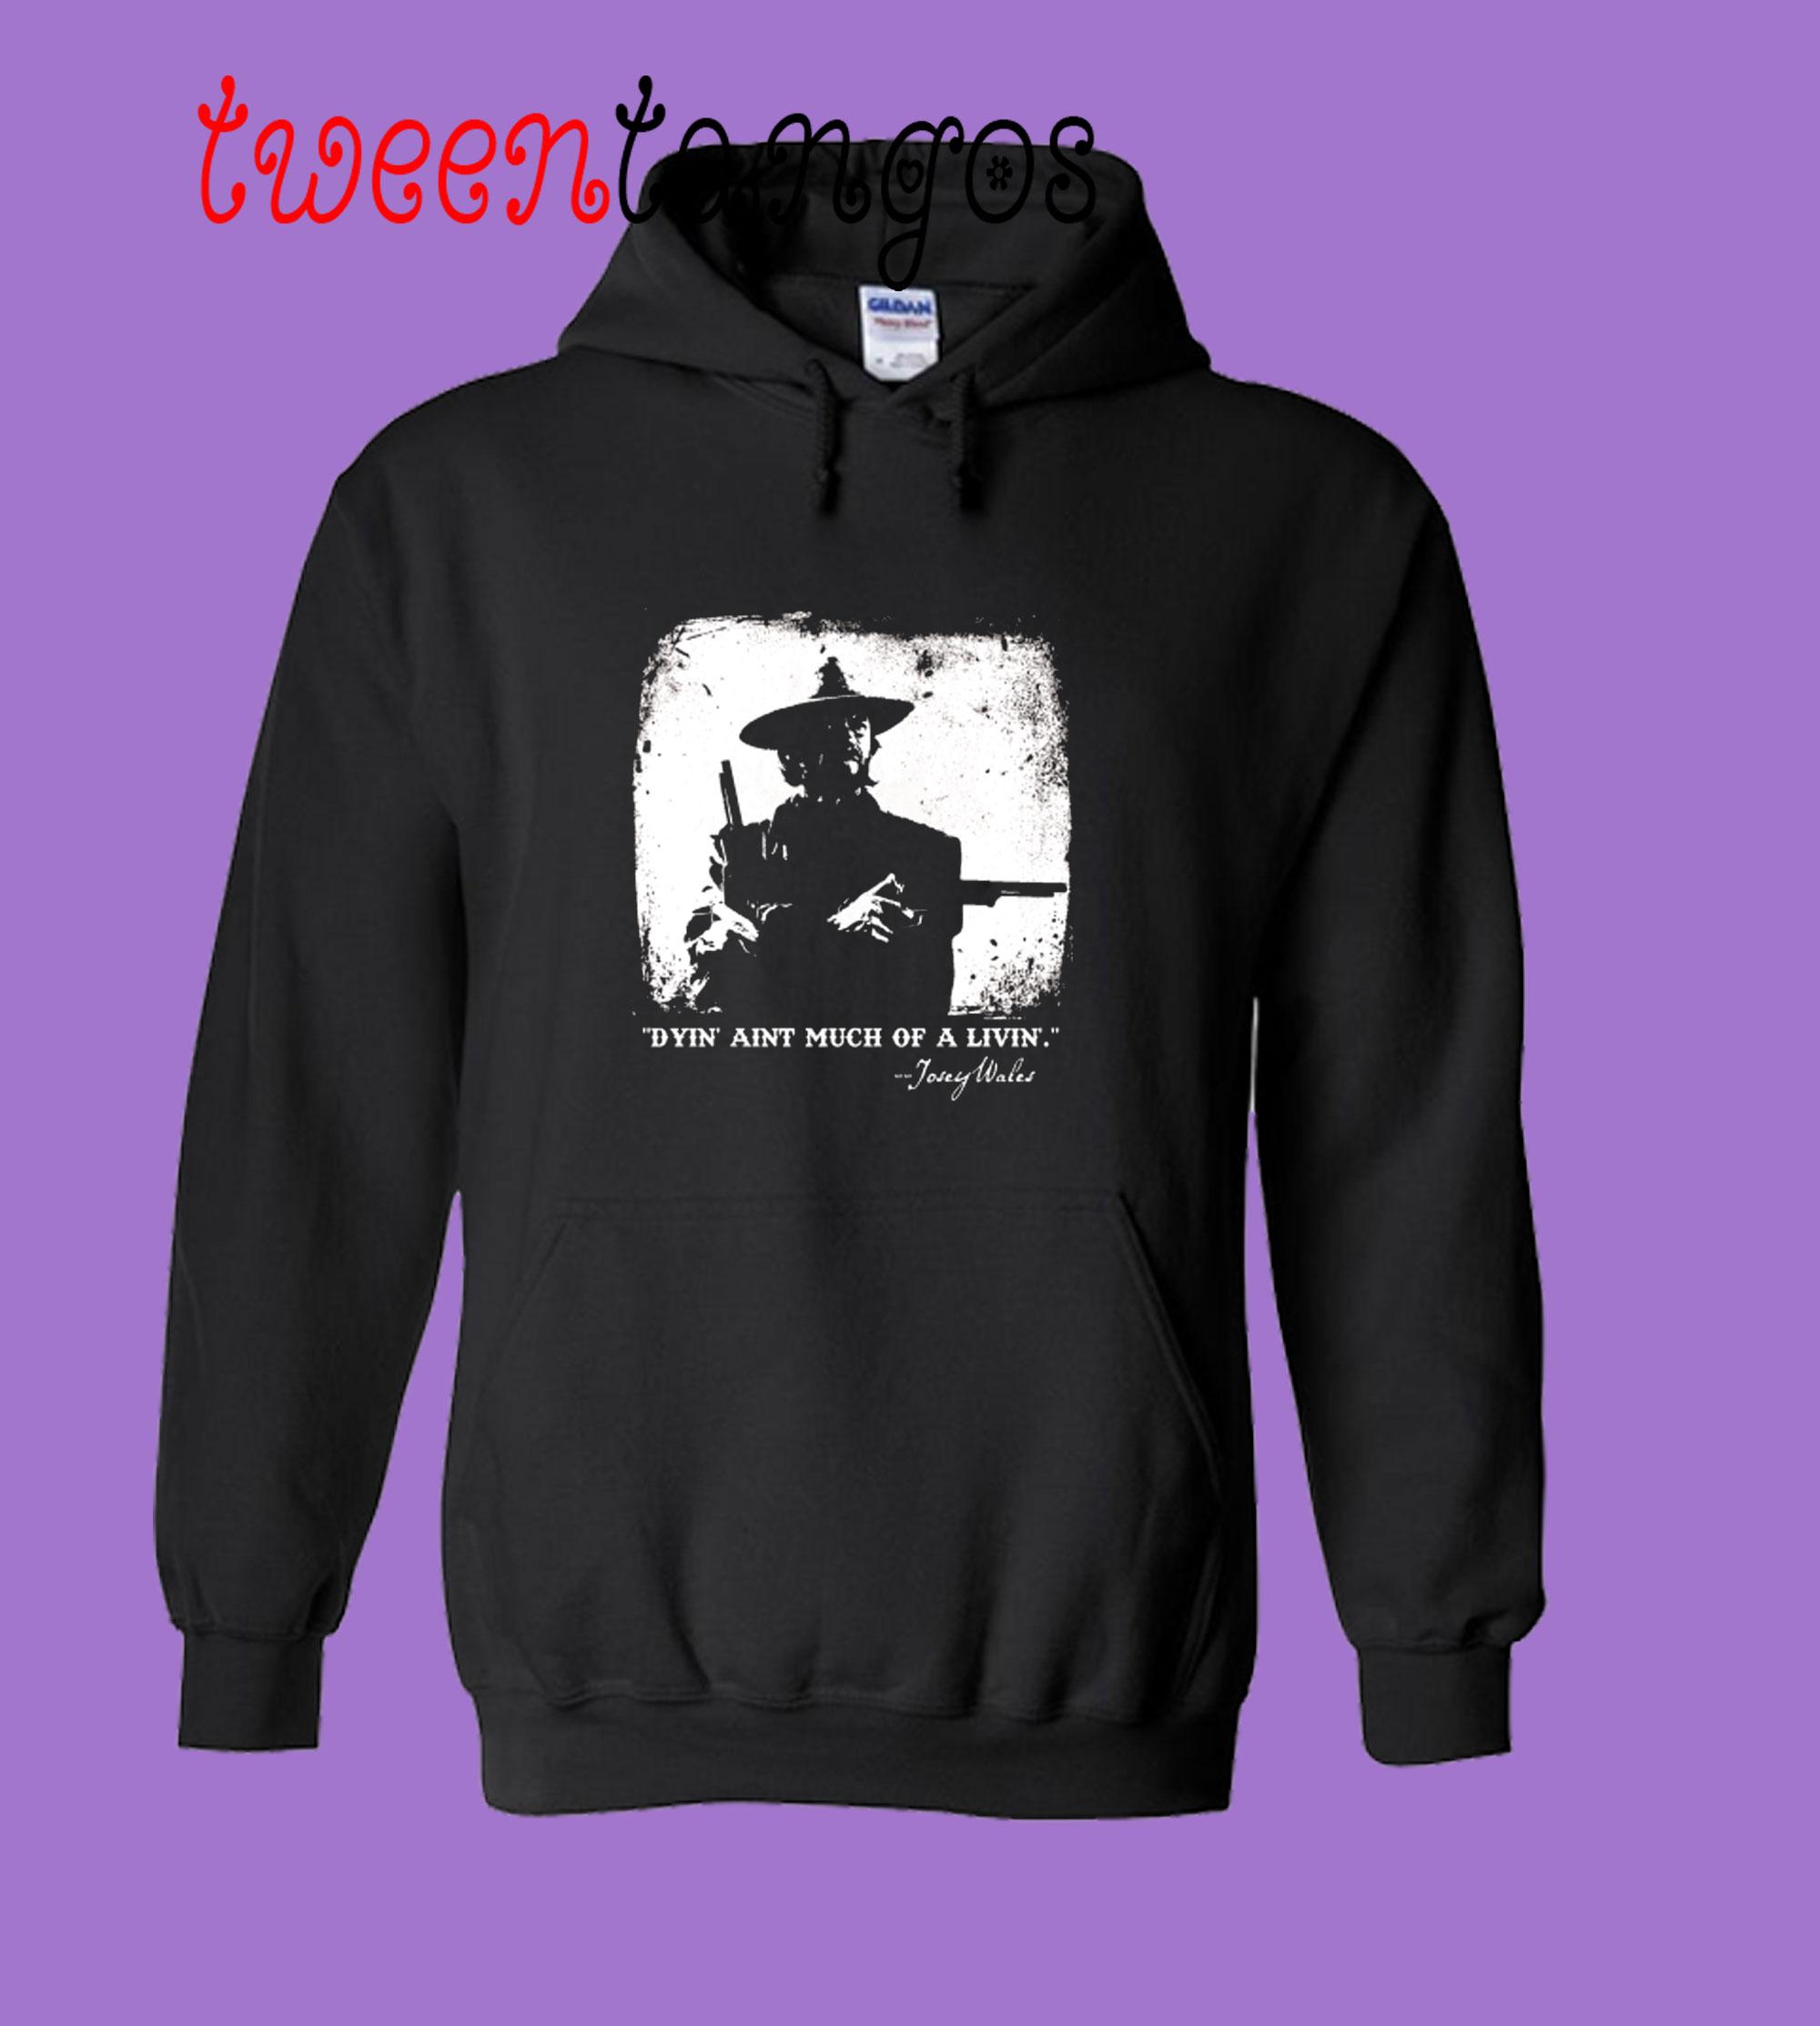 The-Outlaw-Josey-Wales-Hood